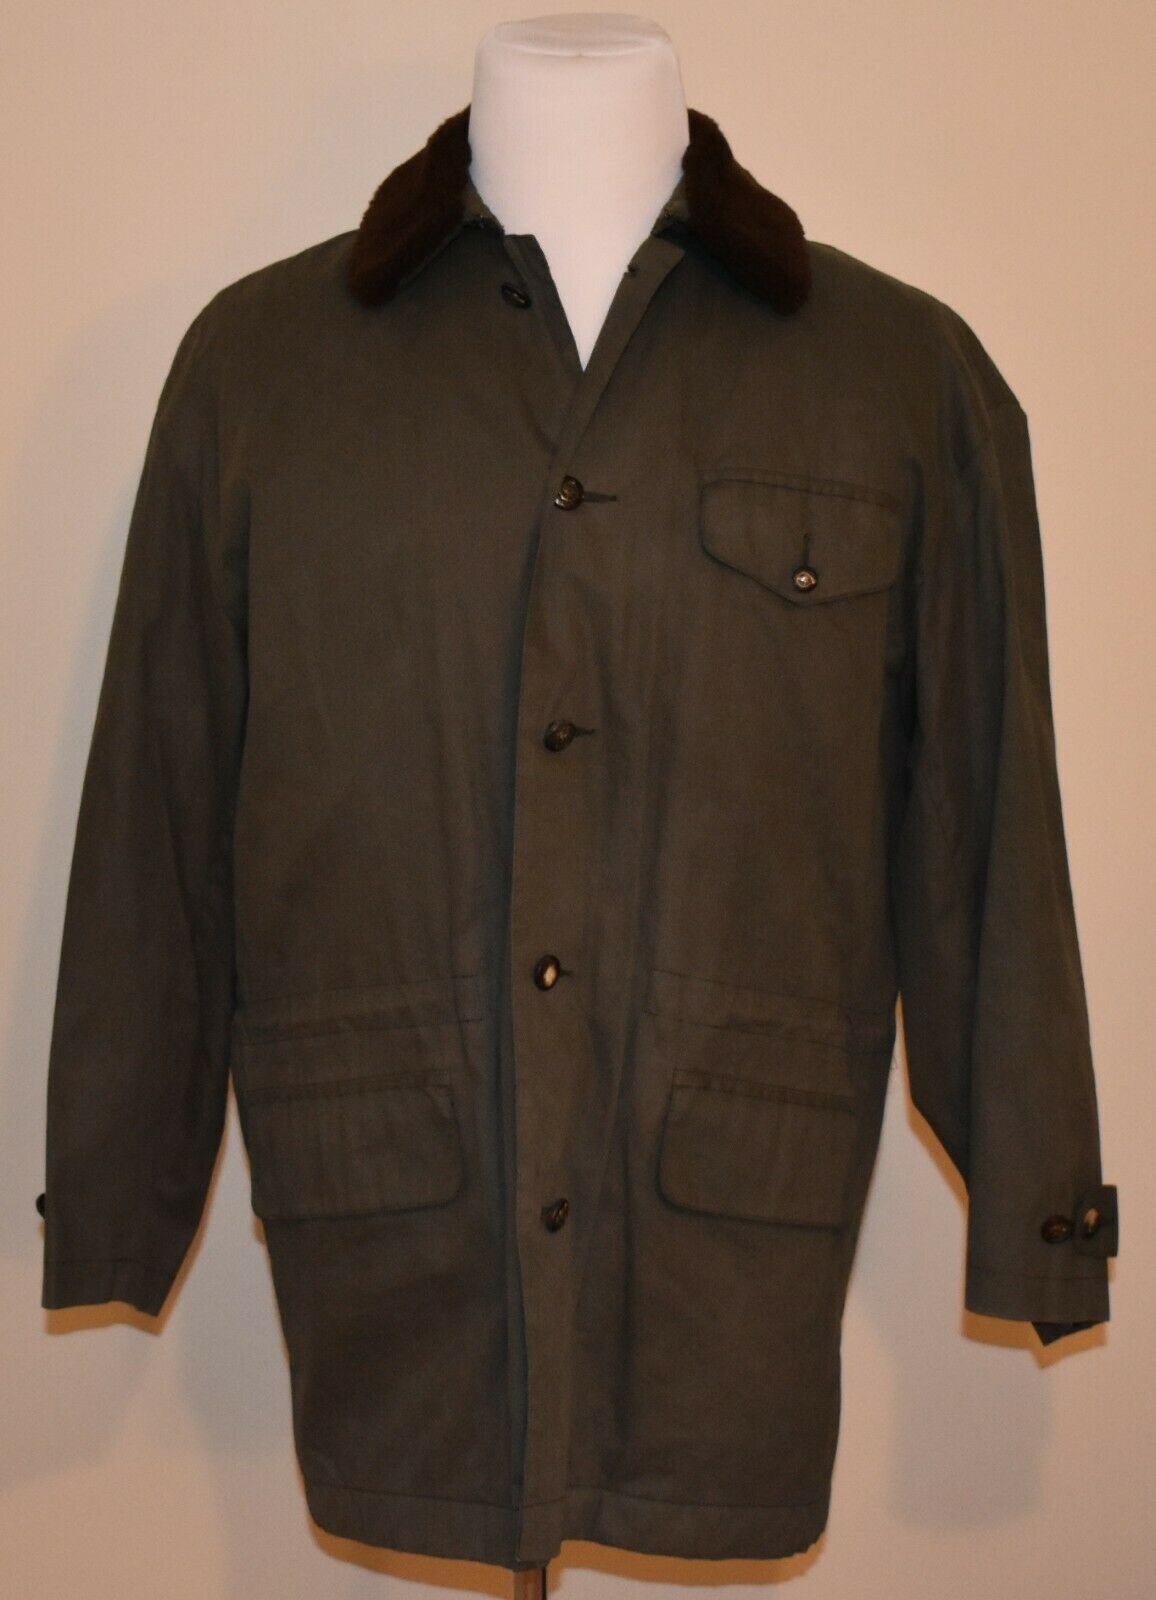 Ralph Lauren Purple Label Collection Mens Medium 100% Cotton Quilted Lining Coat